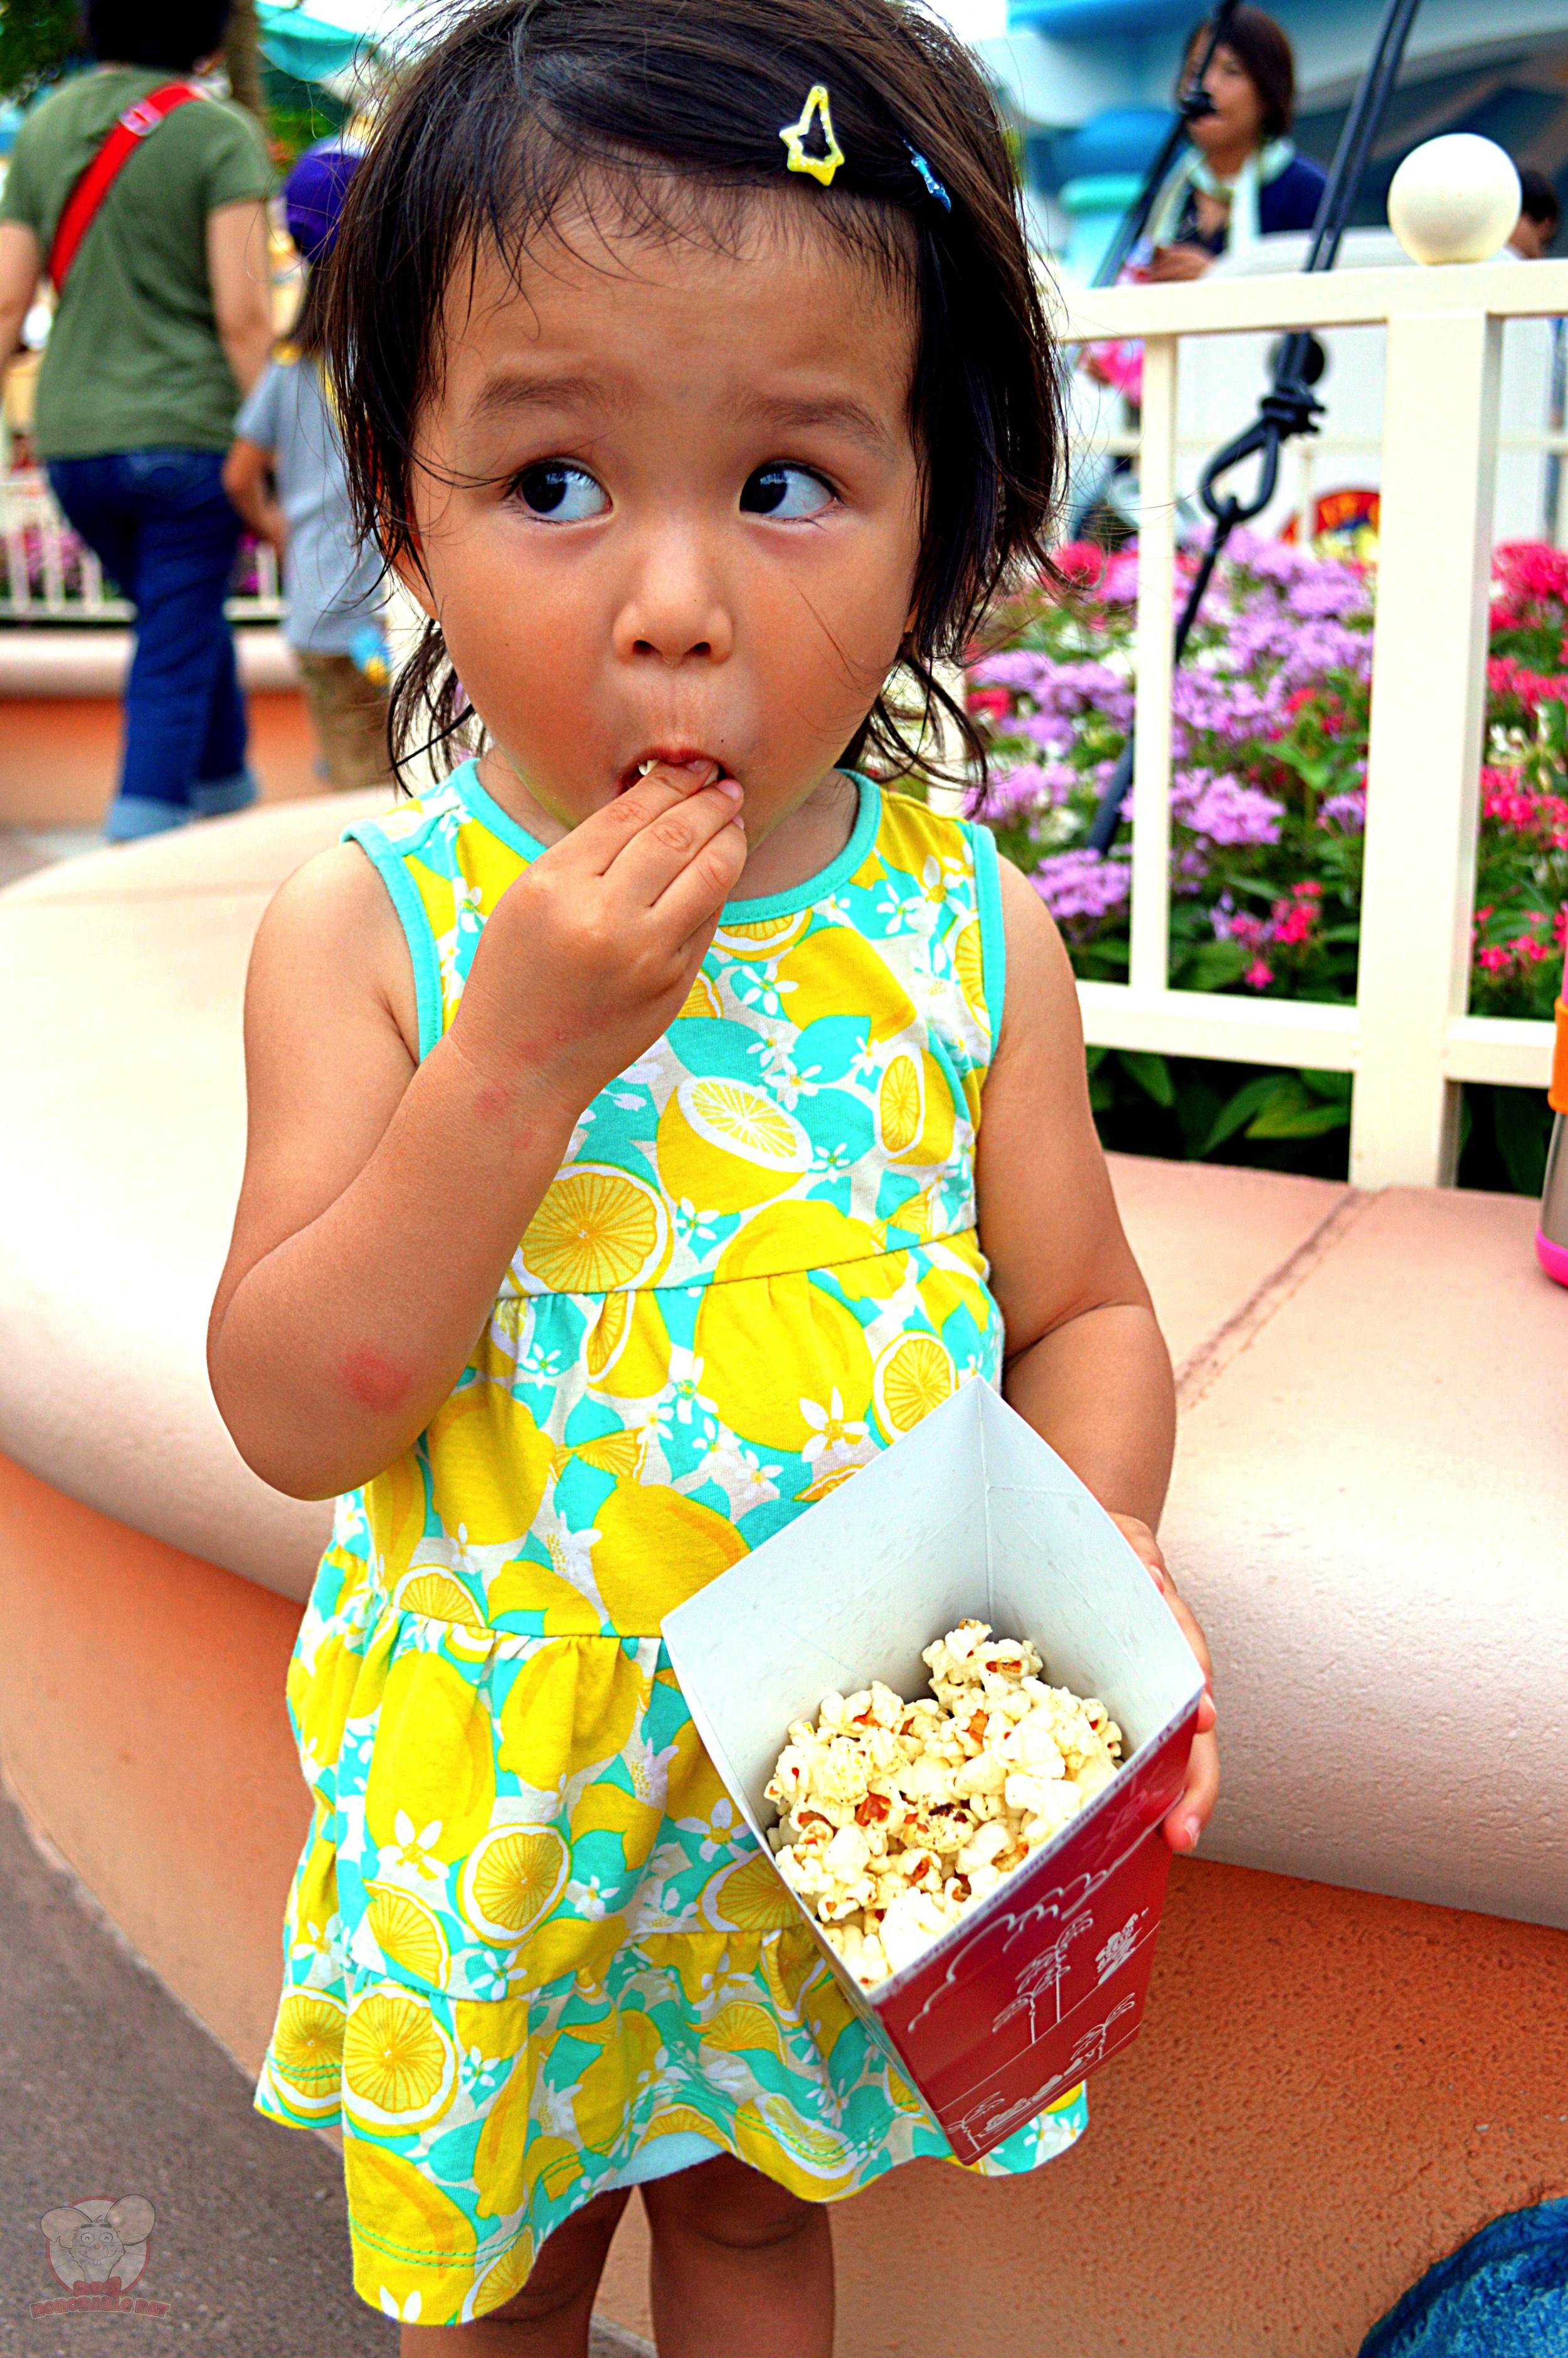 Mahina with her Jalapeno and Cheese Popcorn